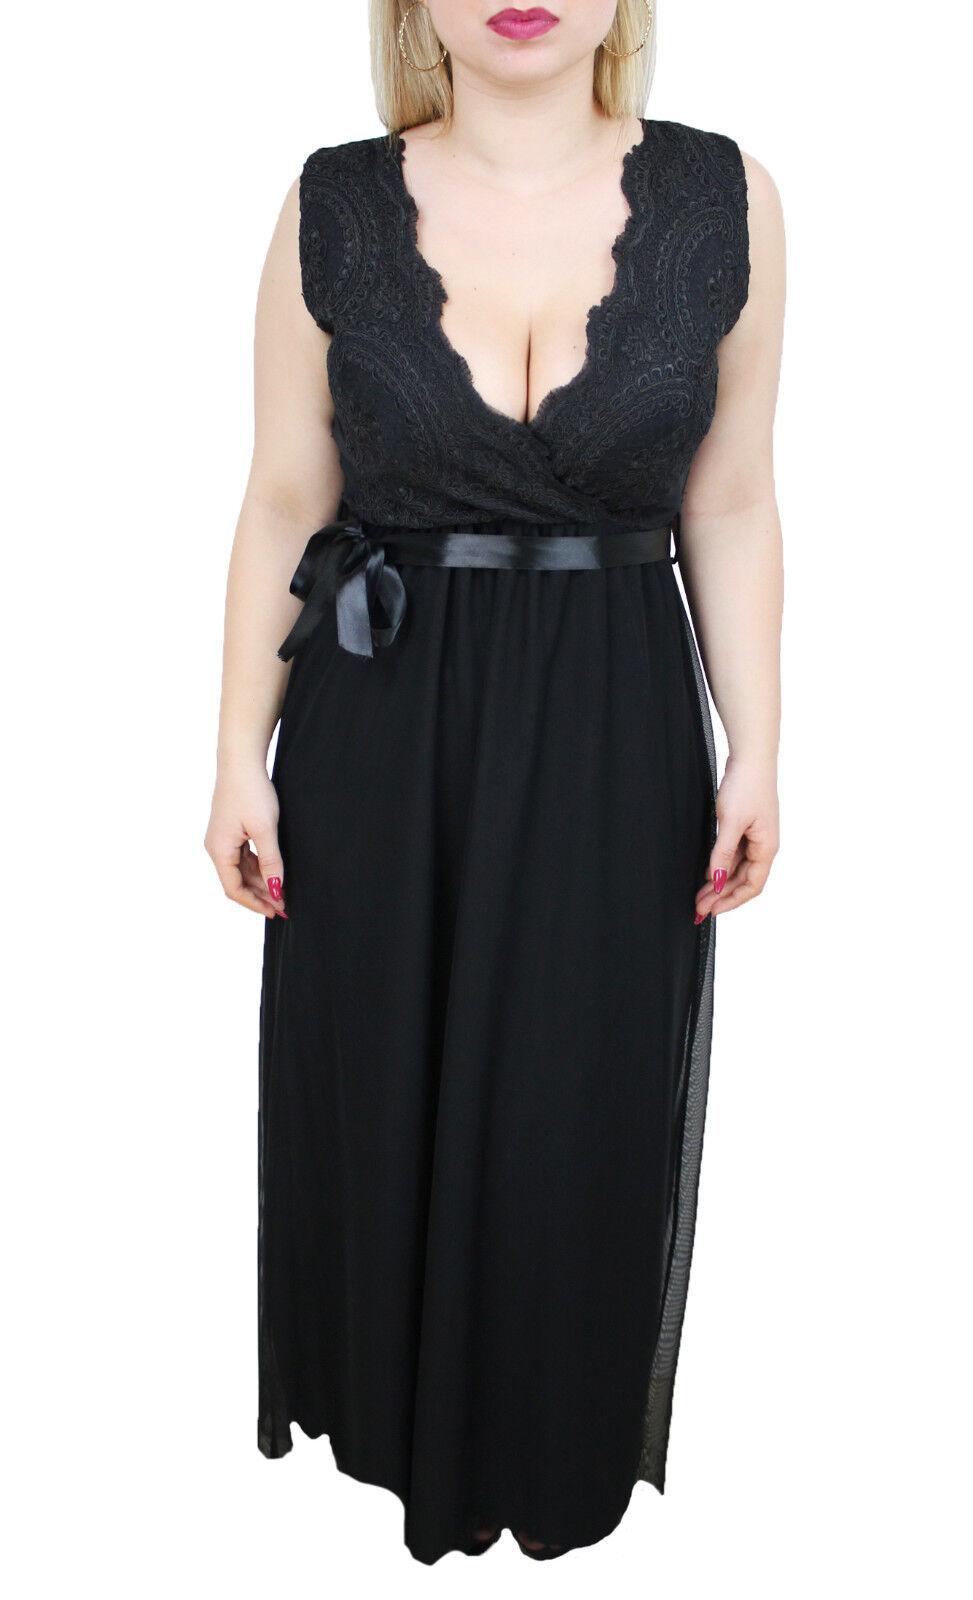 6050 - Kleid Frau schwarz lang 100% made in in in  Kleid Spitze élégant Spitze 38b593